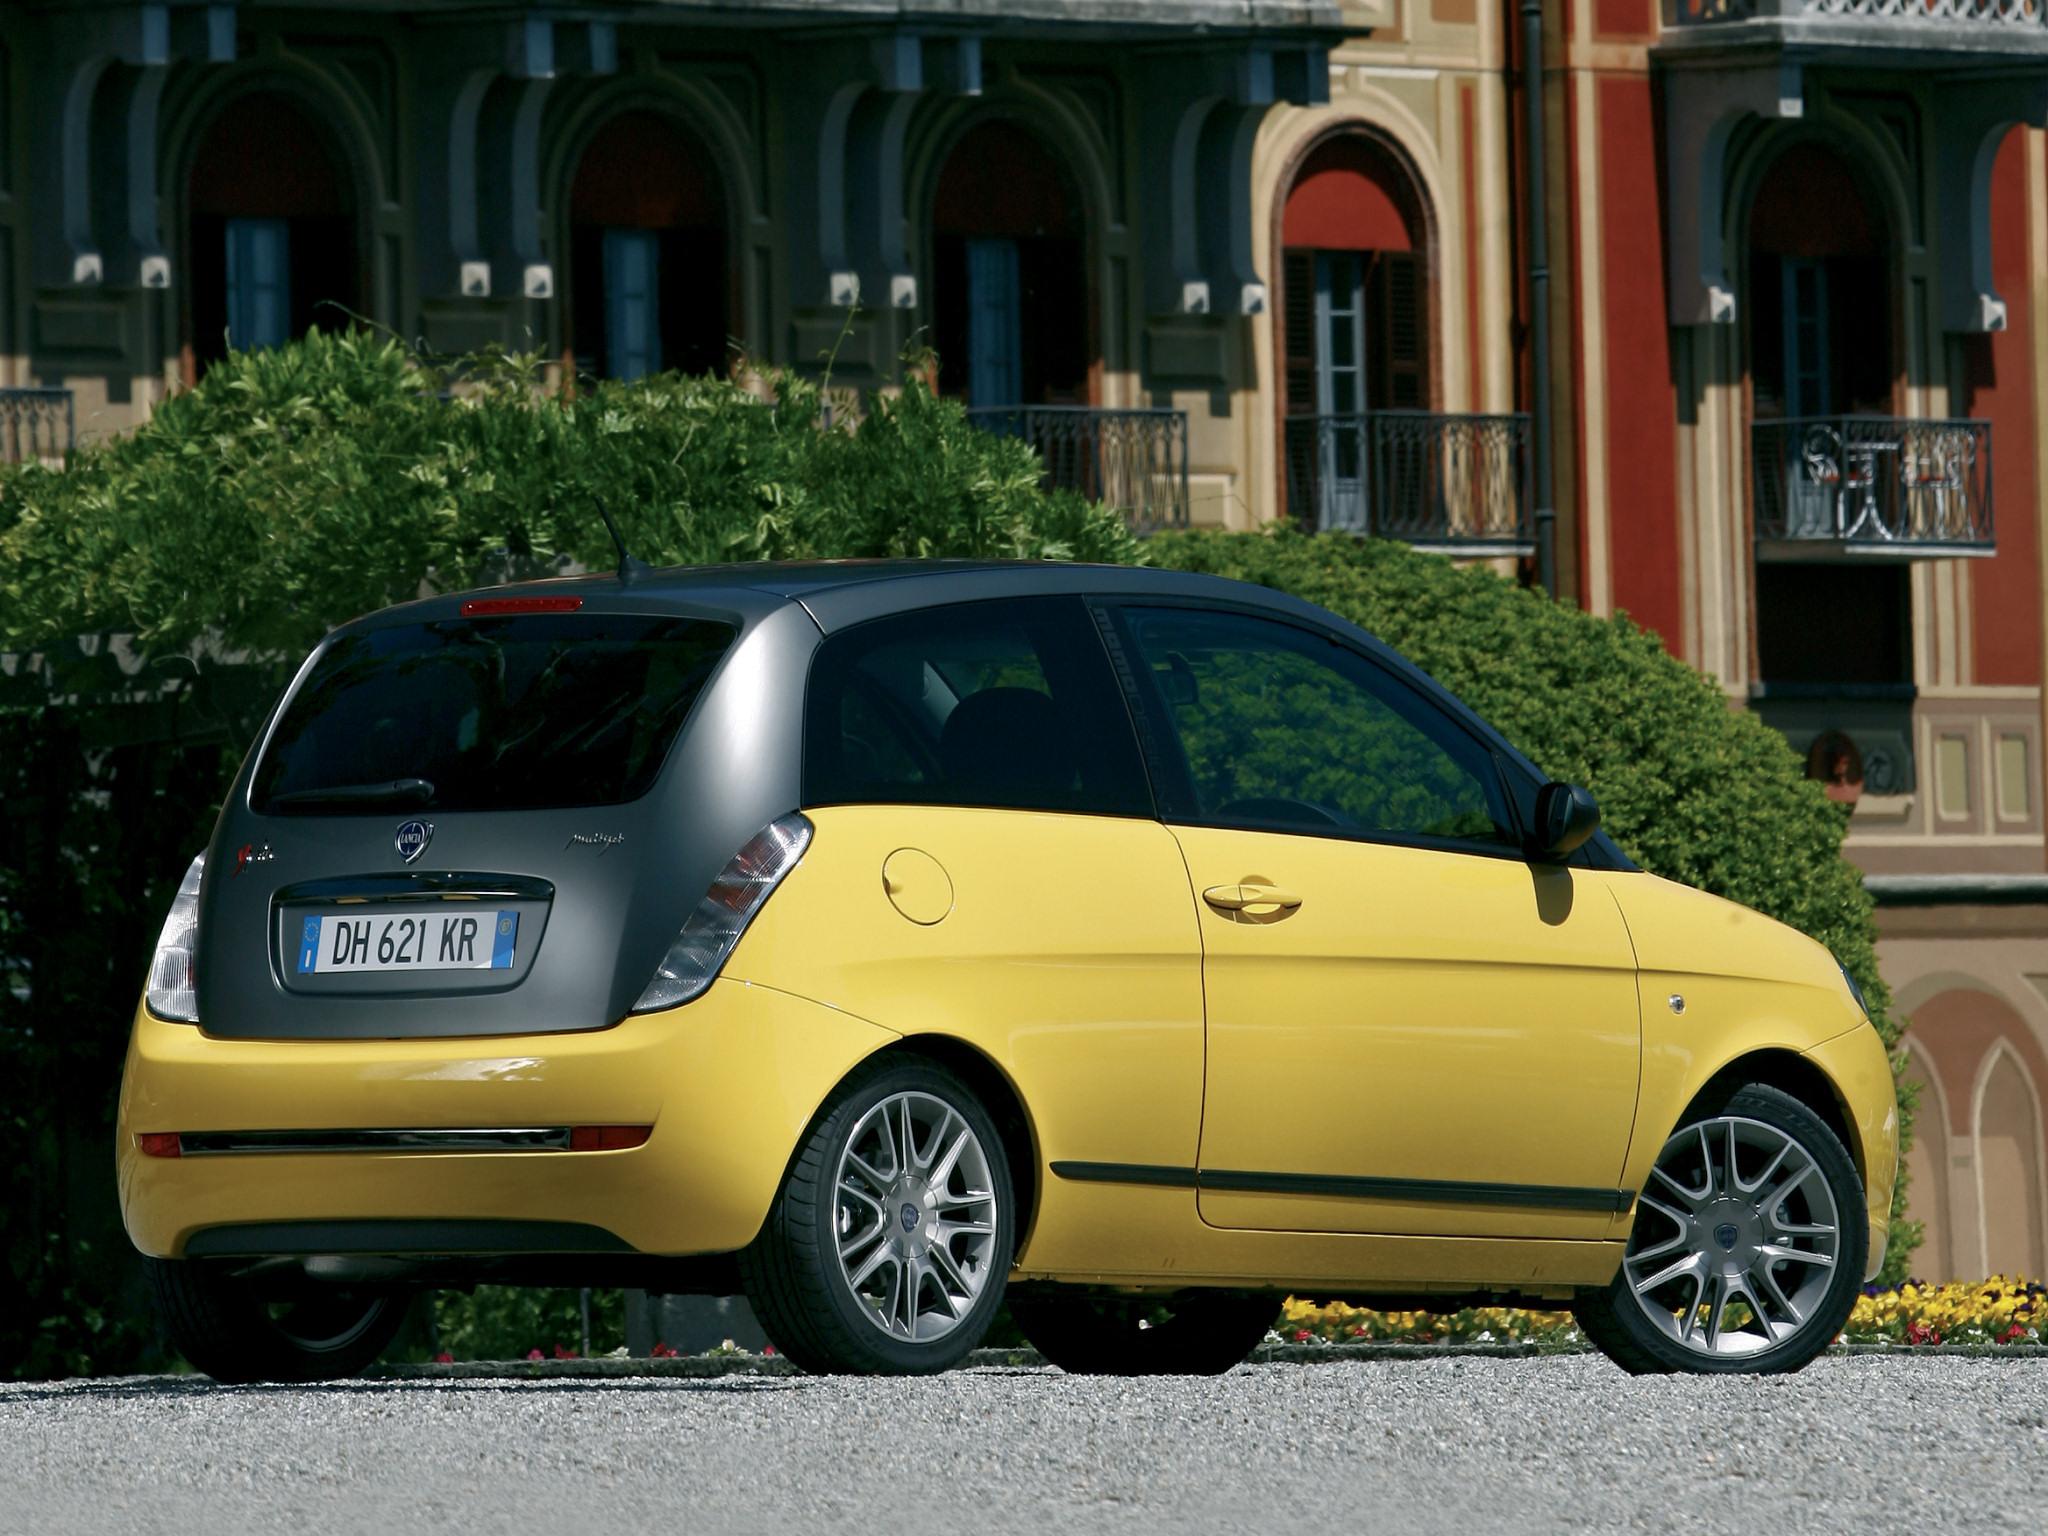 http://carinpicture.com/wp-content/uploads/2012/07/Lancia-Ypsilon-Sport-MOMO-Design-2007-Photo-05.jpg